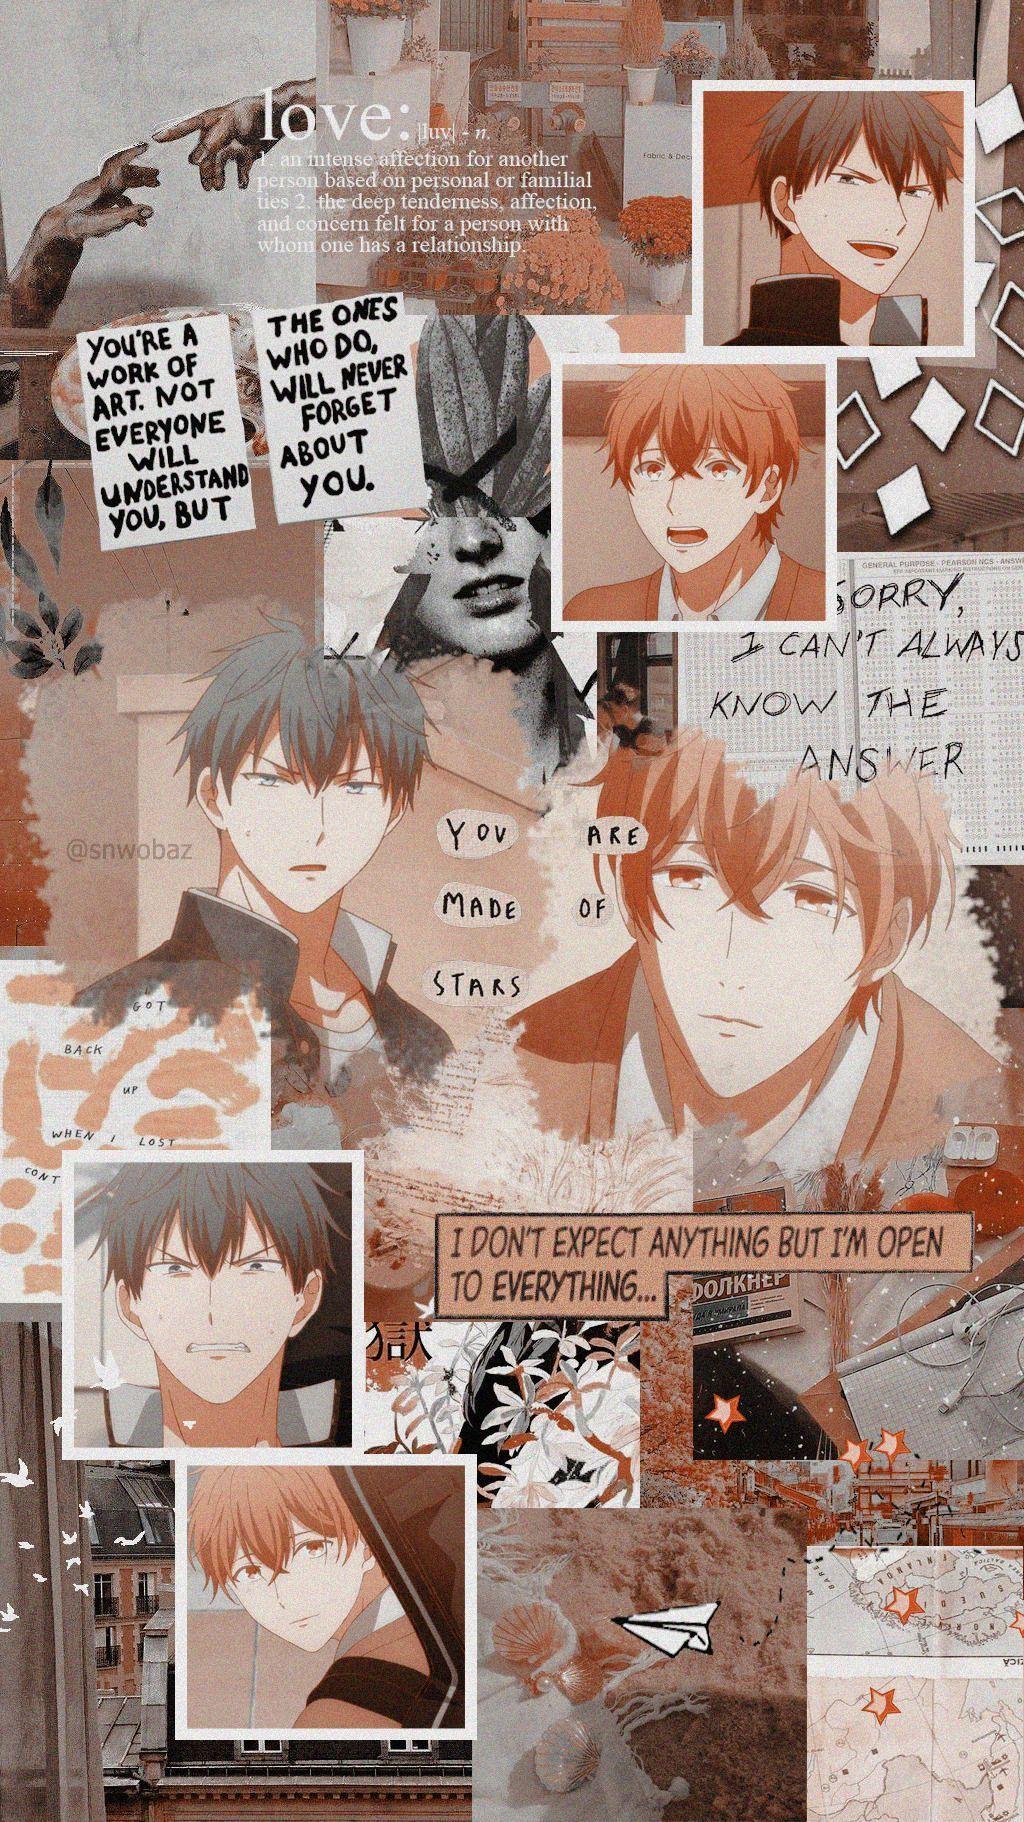 ɢɪᴠᴇɴ ϟ ᴍᴇᴍᴇs 𝑐𝑖𝑛𝑐𝑜 Anime estético, Fondo de anime y